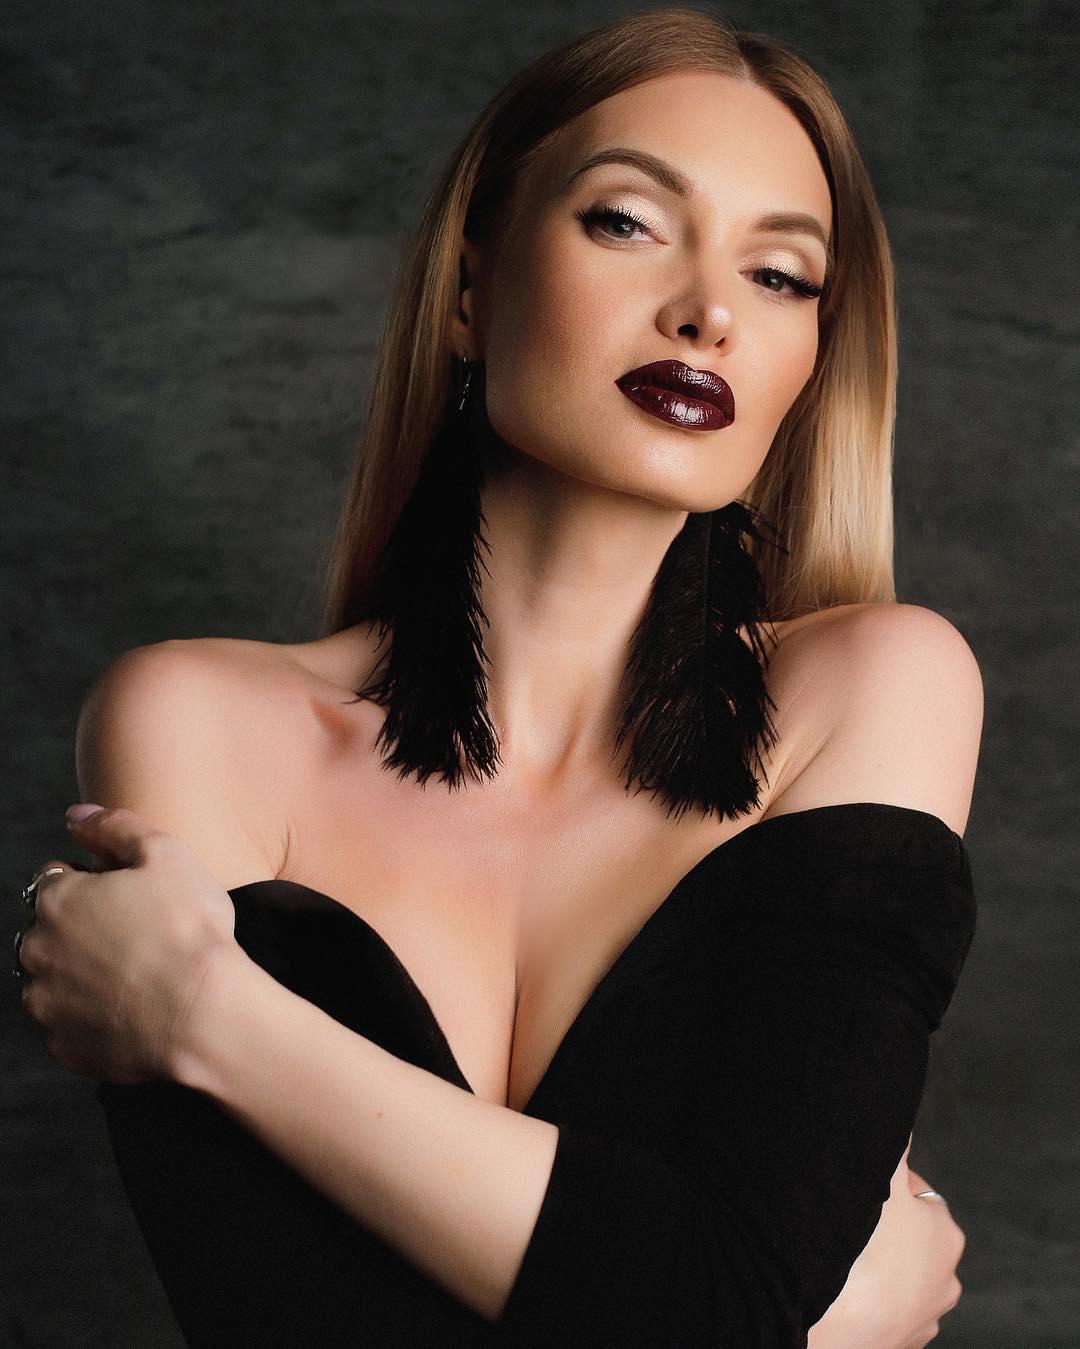 Евгения Феофилактова: Я снова с вами, мои друзья #FEOFILAKTOVAEVGENIYA